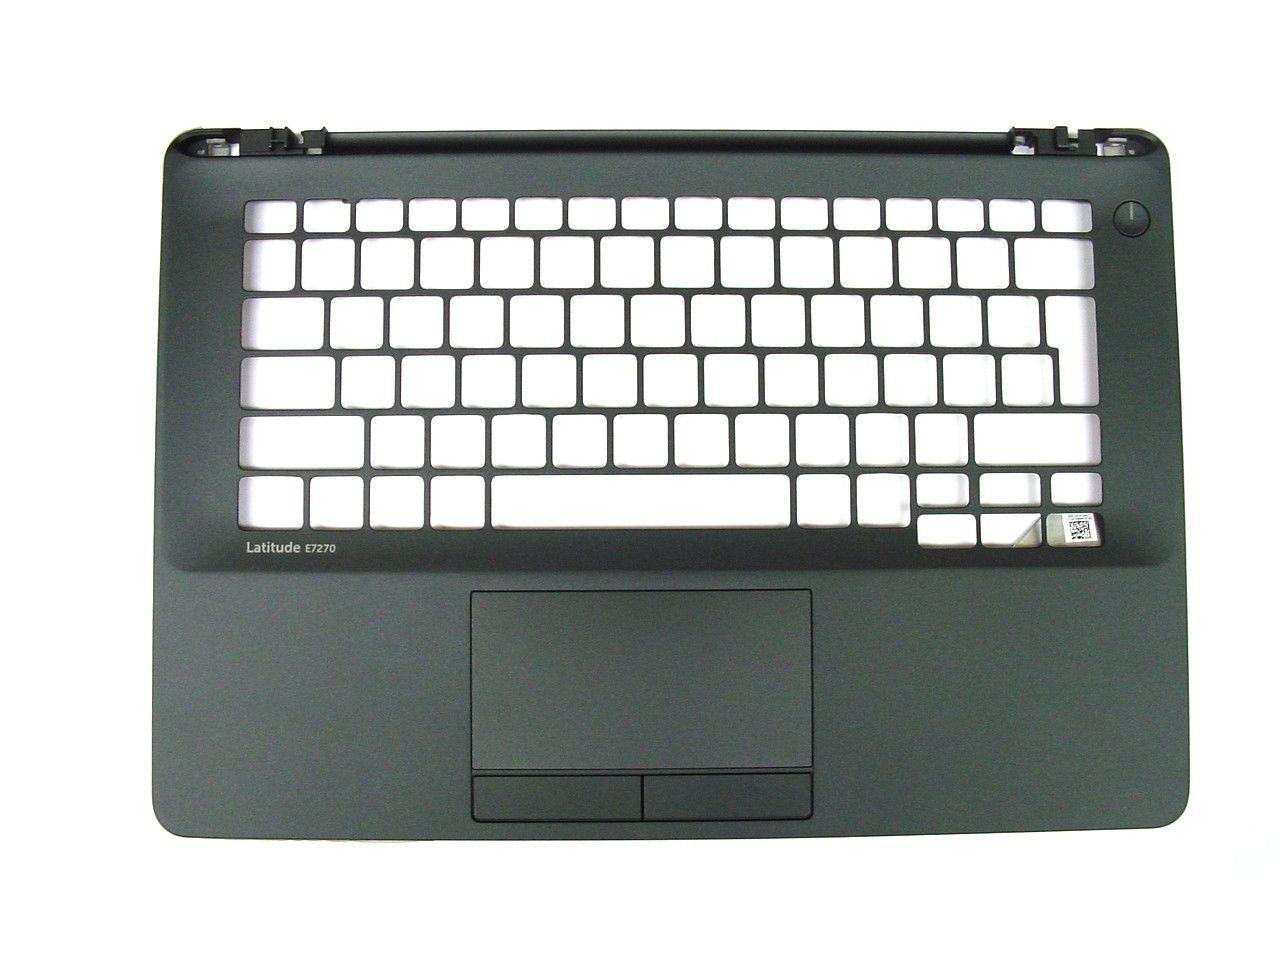 DELL Latitude E7270 Palmrest Touchpad Smartcard Reader 4H6Y1